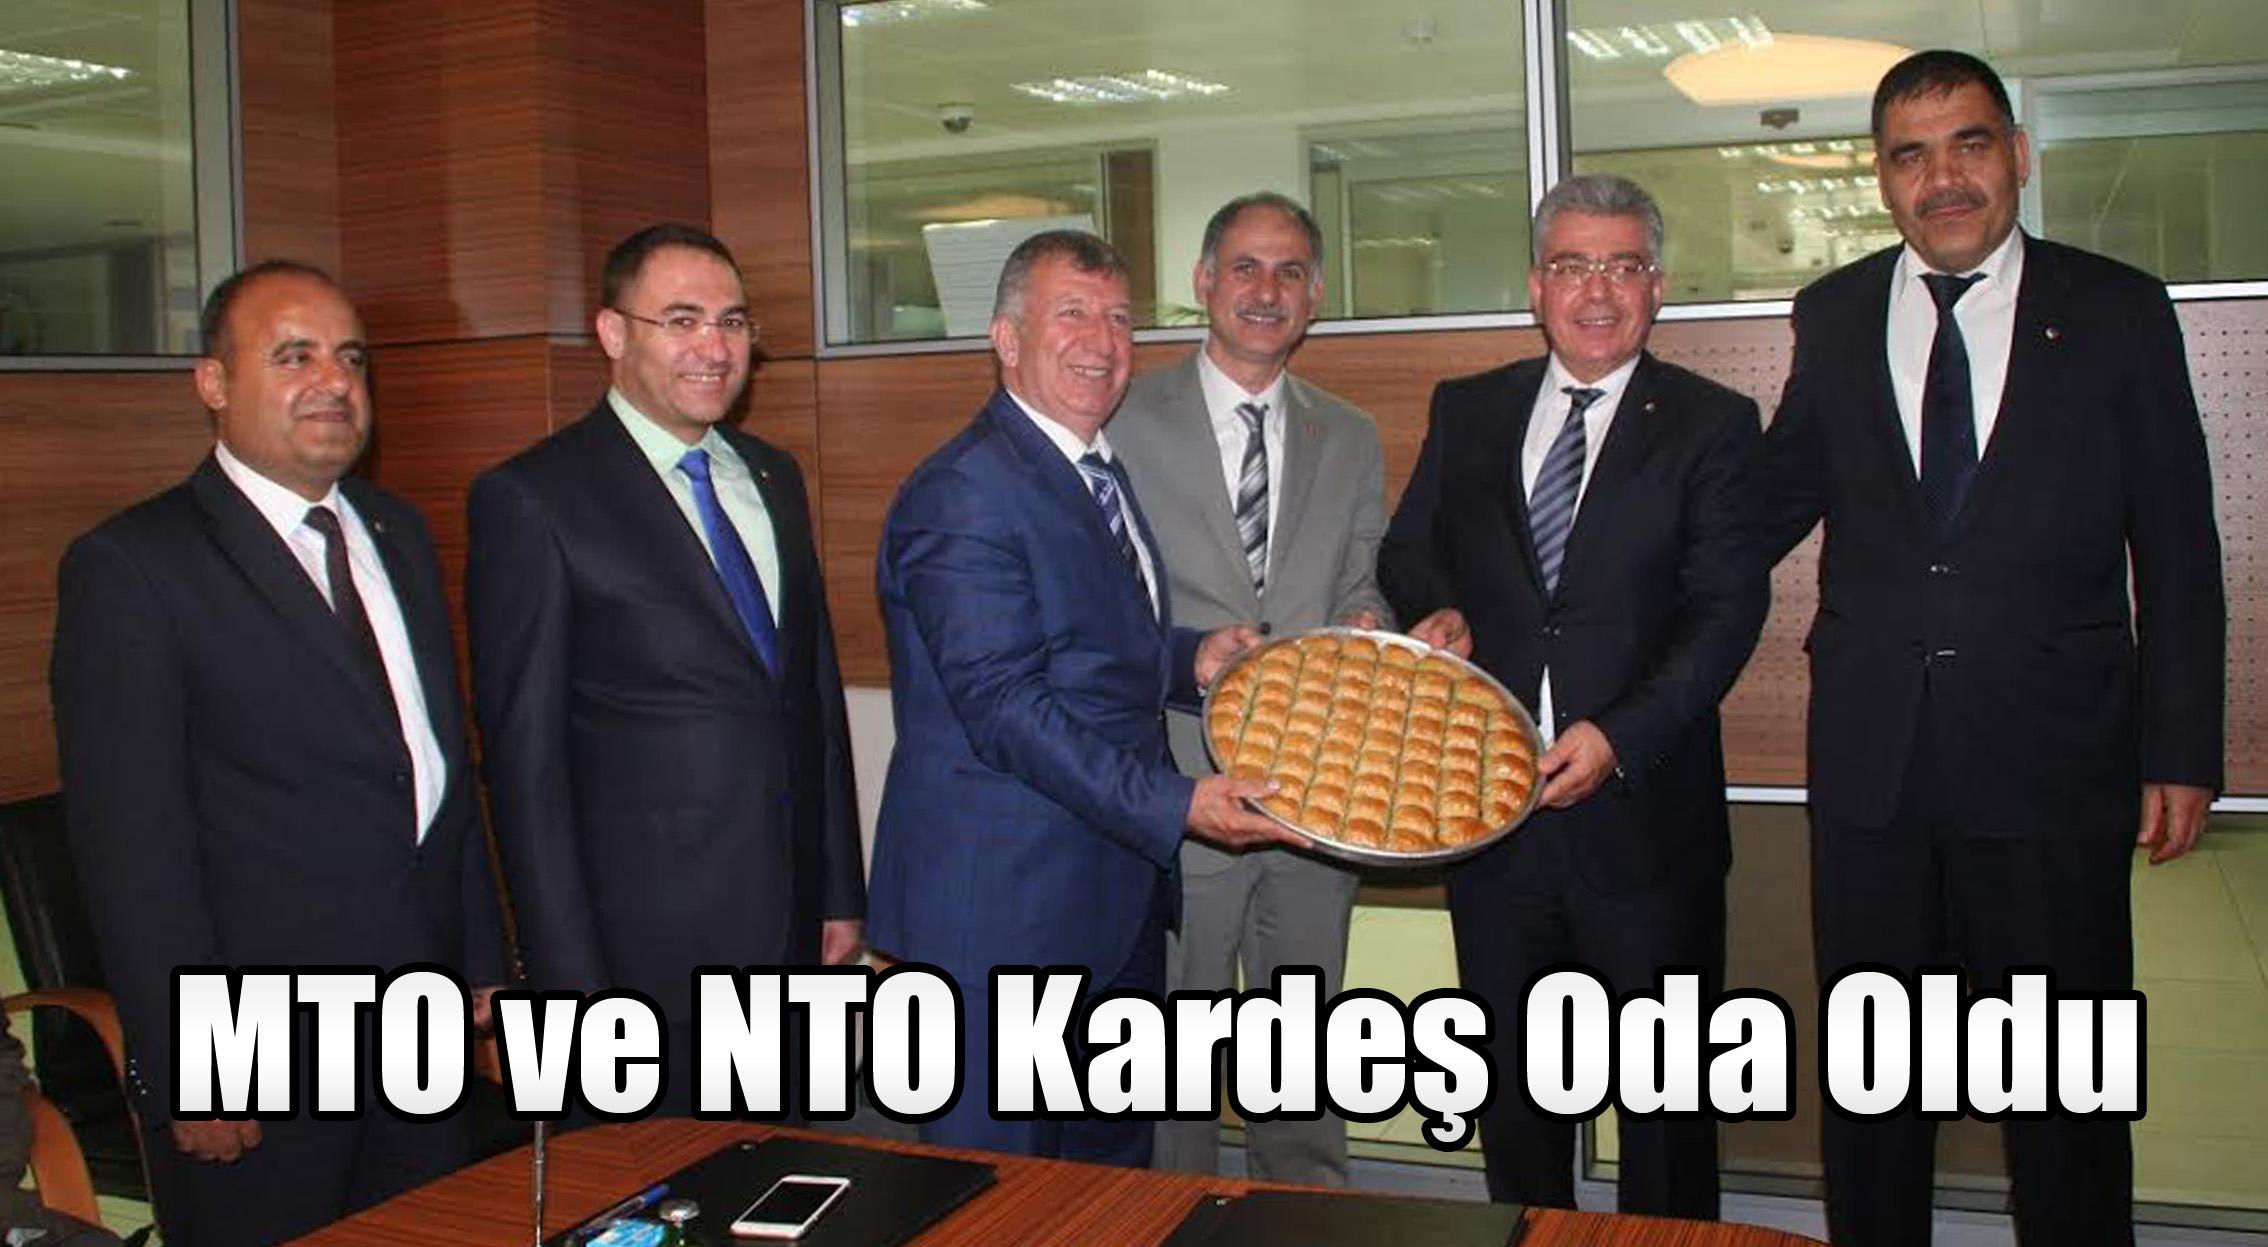 MTO ve NTO Kardeş Oda Oldu